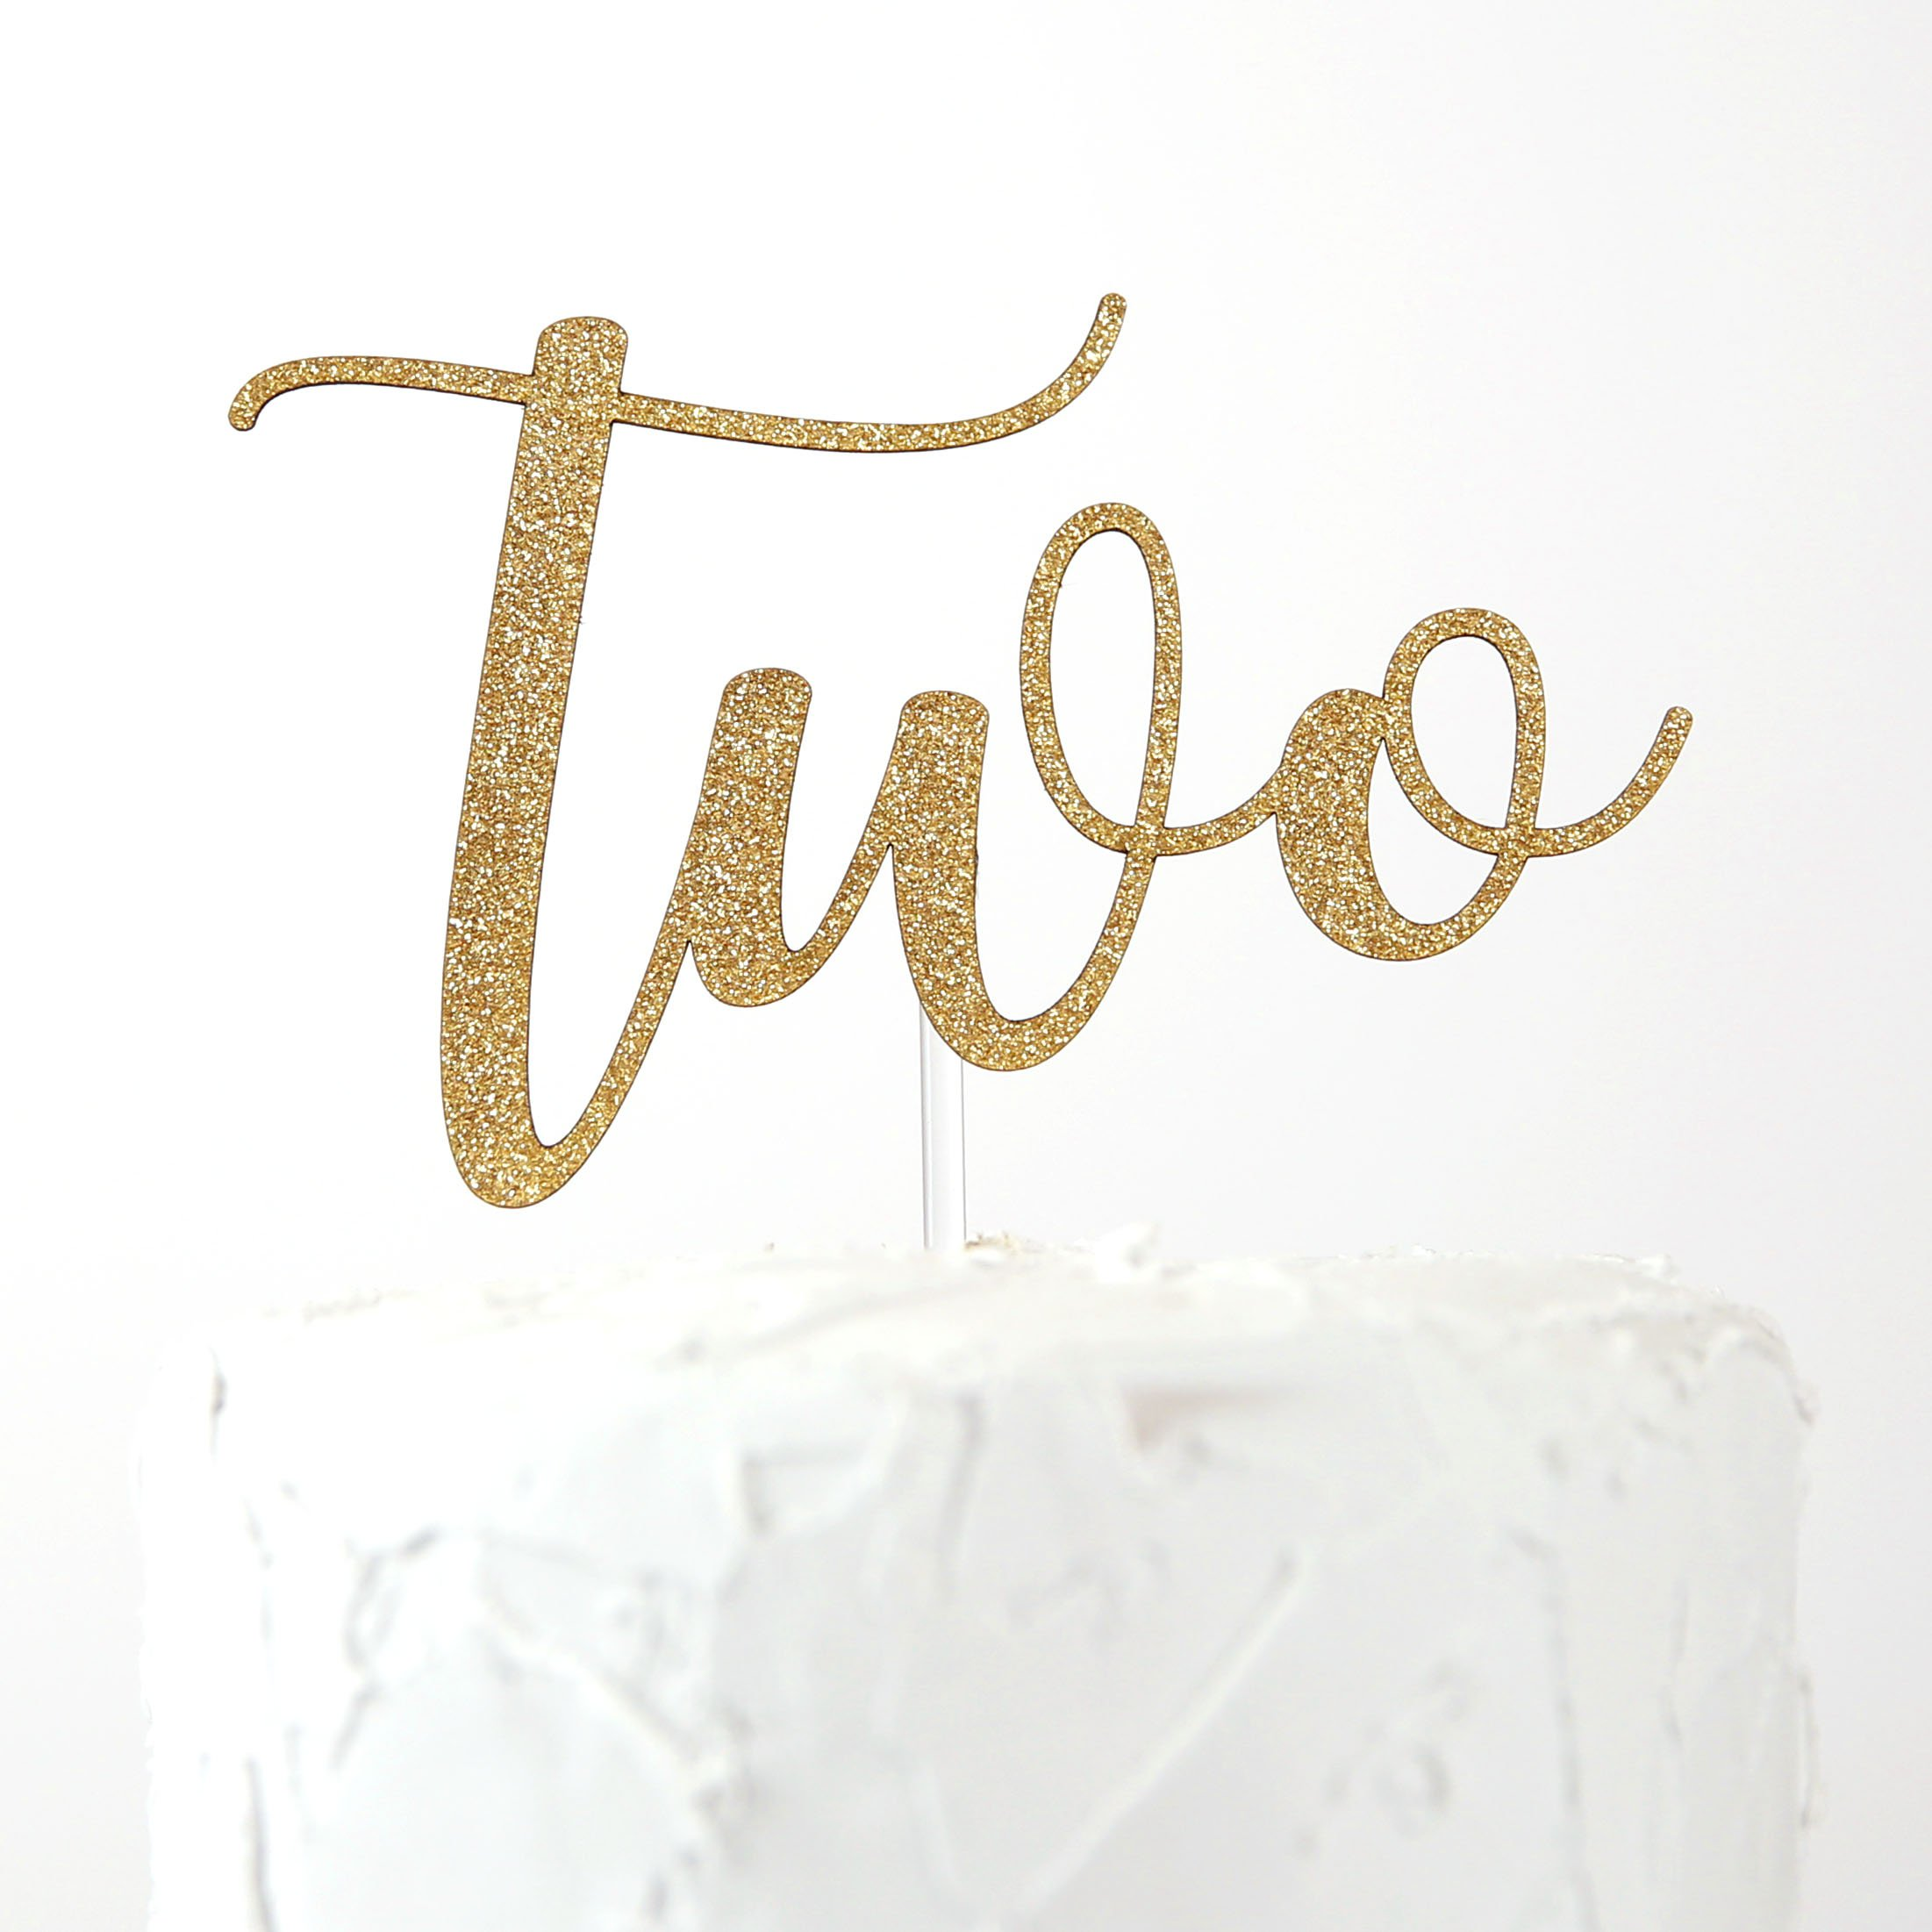 NANASUKO 2nd Birthday Cake Topper - two - Premium quality Made in USA